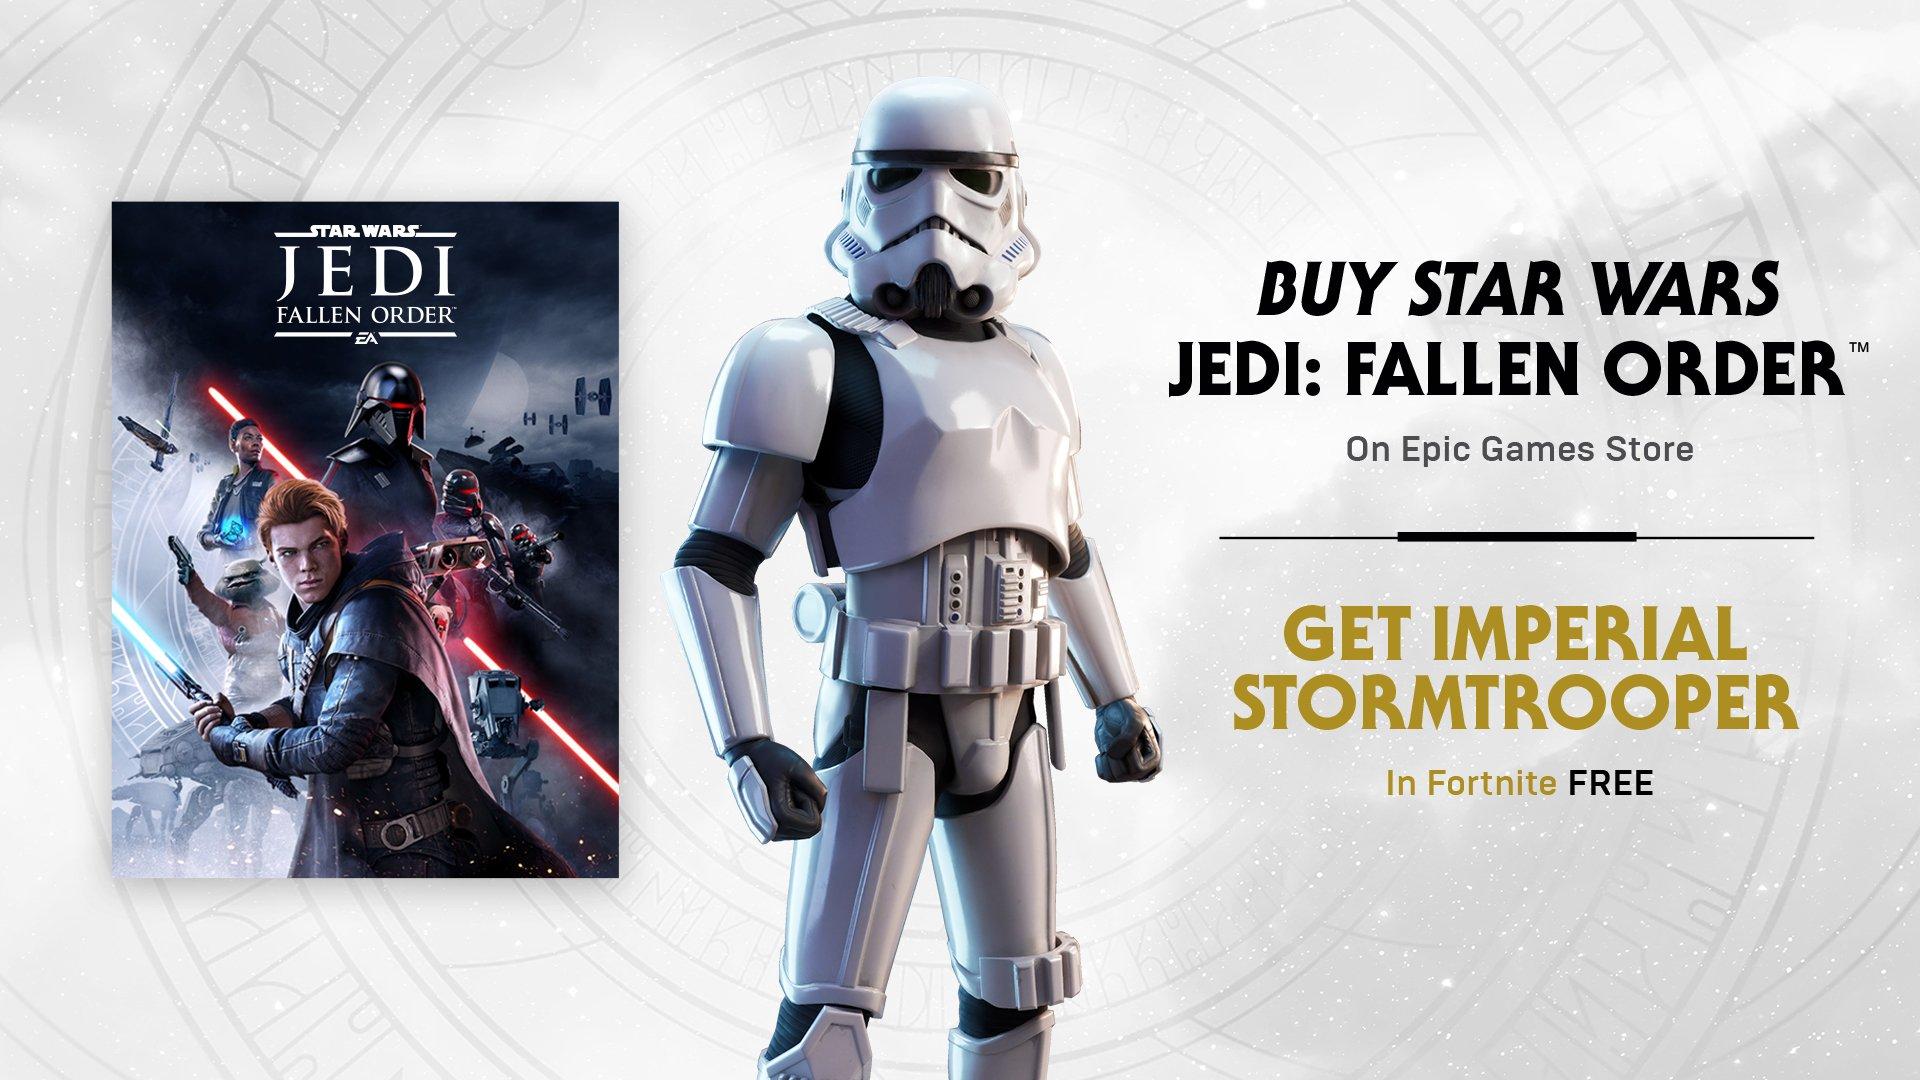 Star Wars Fortnite Event Brings Jedi Fallen Order To